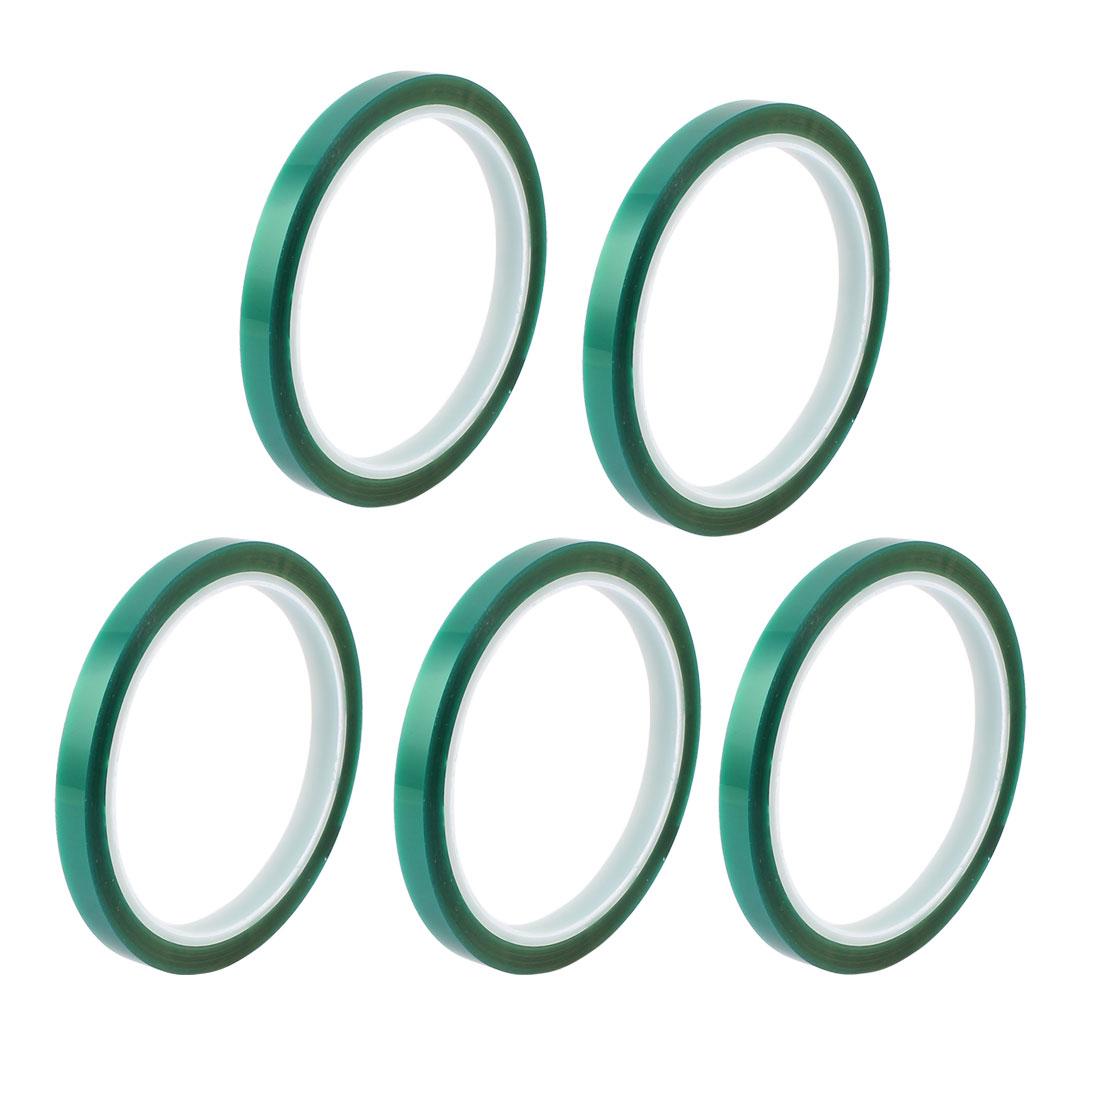 5pcs 8mm Width 33M Long Green PET High Temperature Heat Resistant PCB Solder Tape